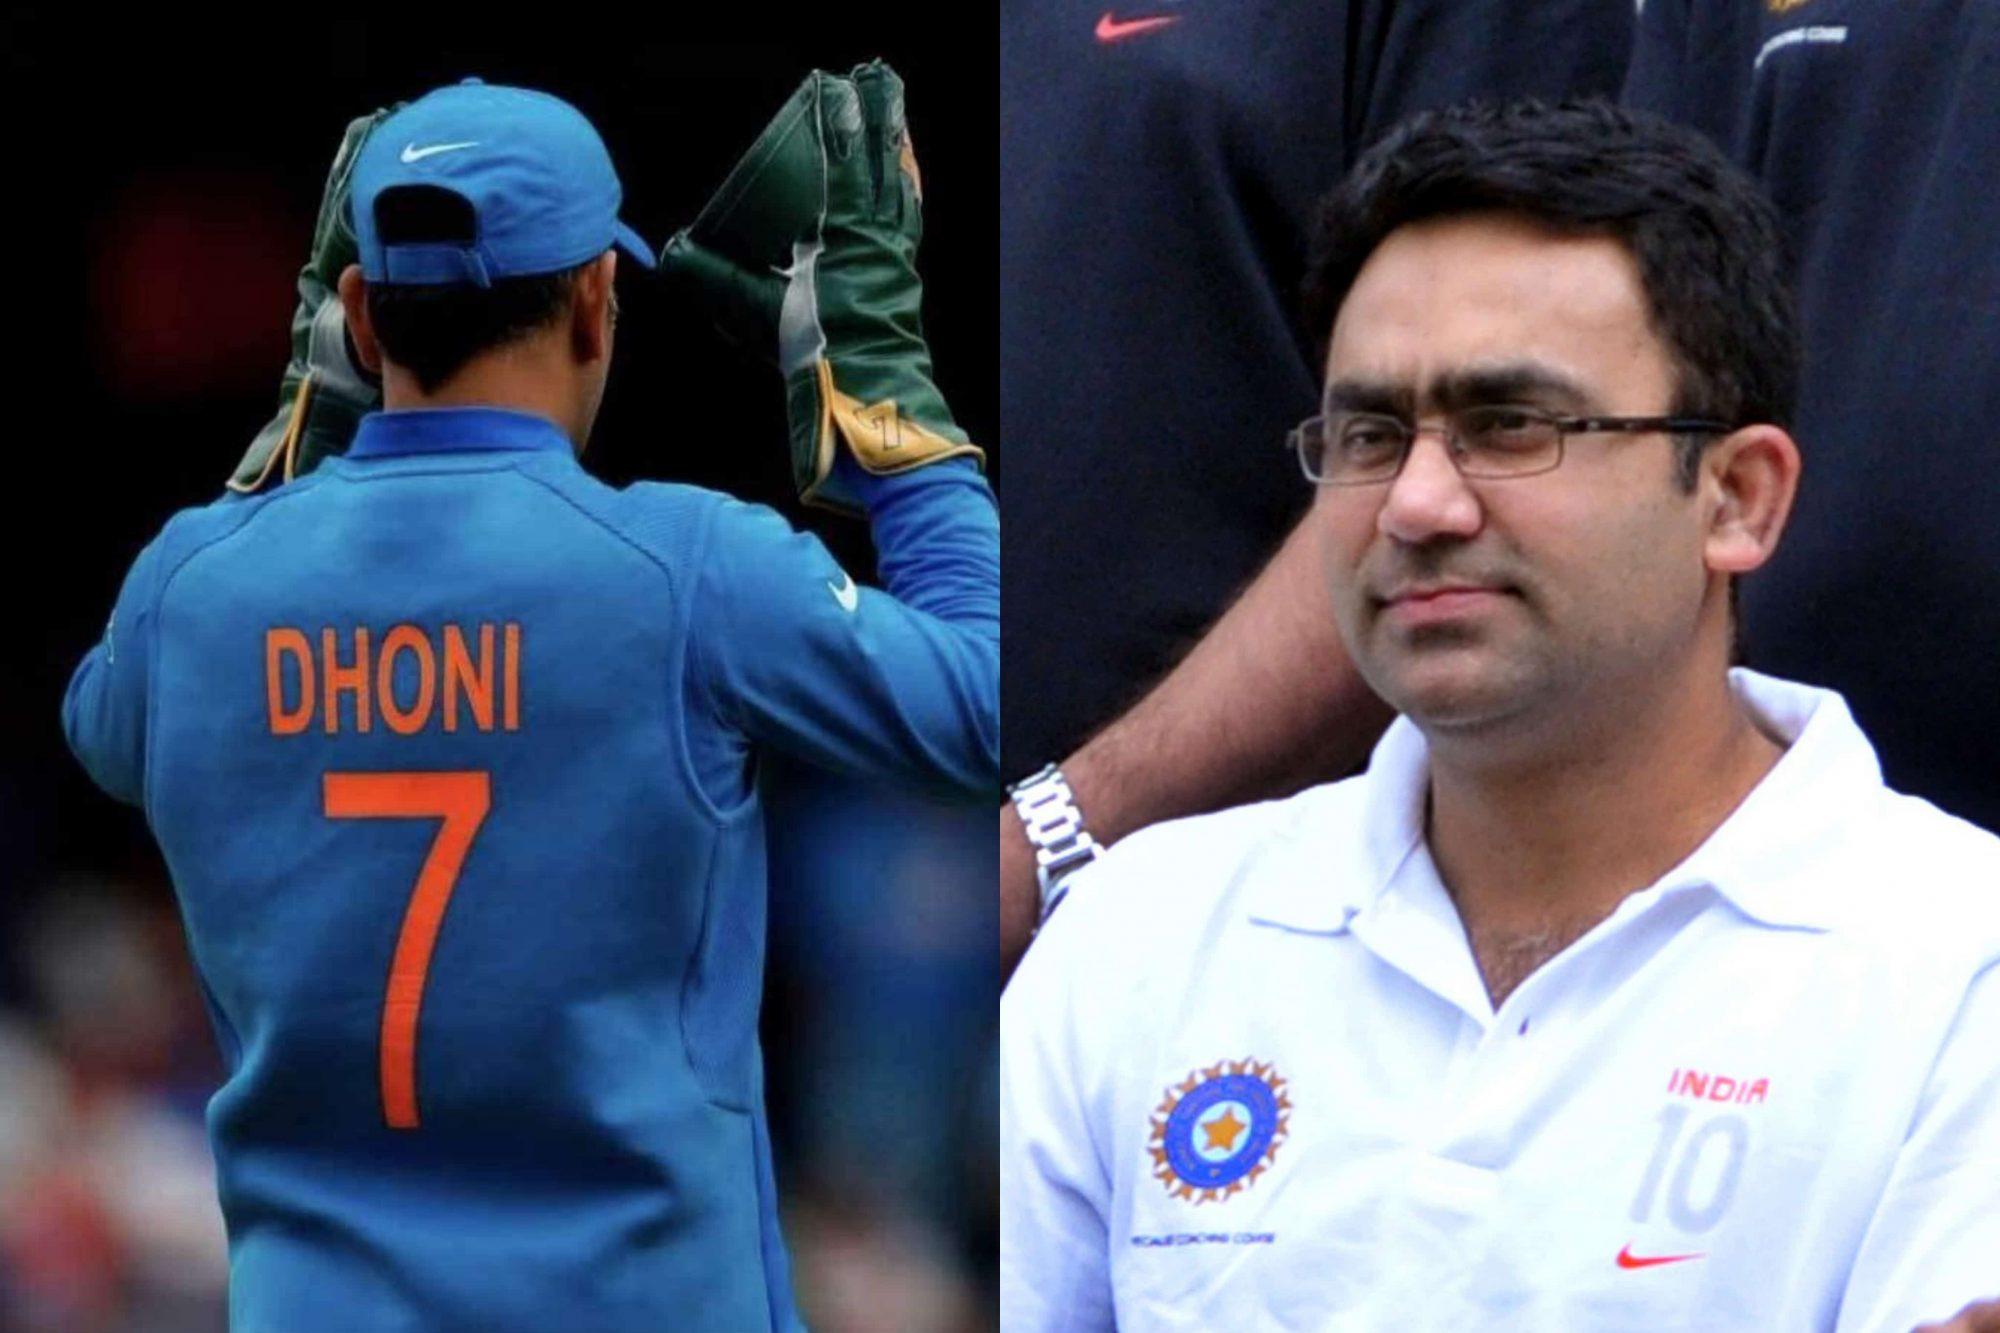 BCCI Should Retire Mahendra Singh Dhoni's Jersey Number 7: Saba Karim